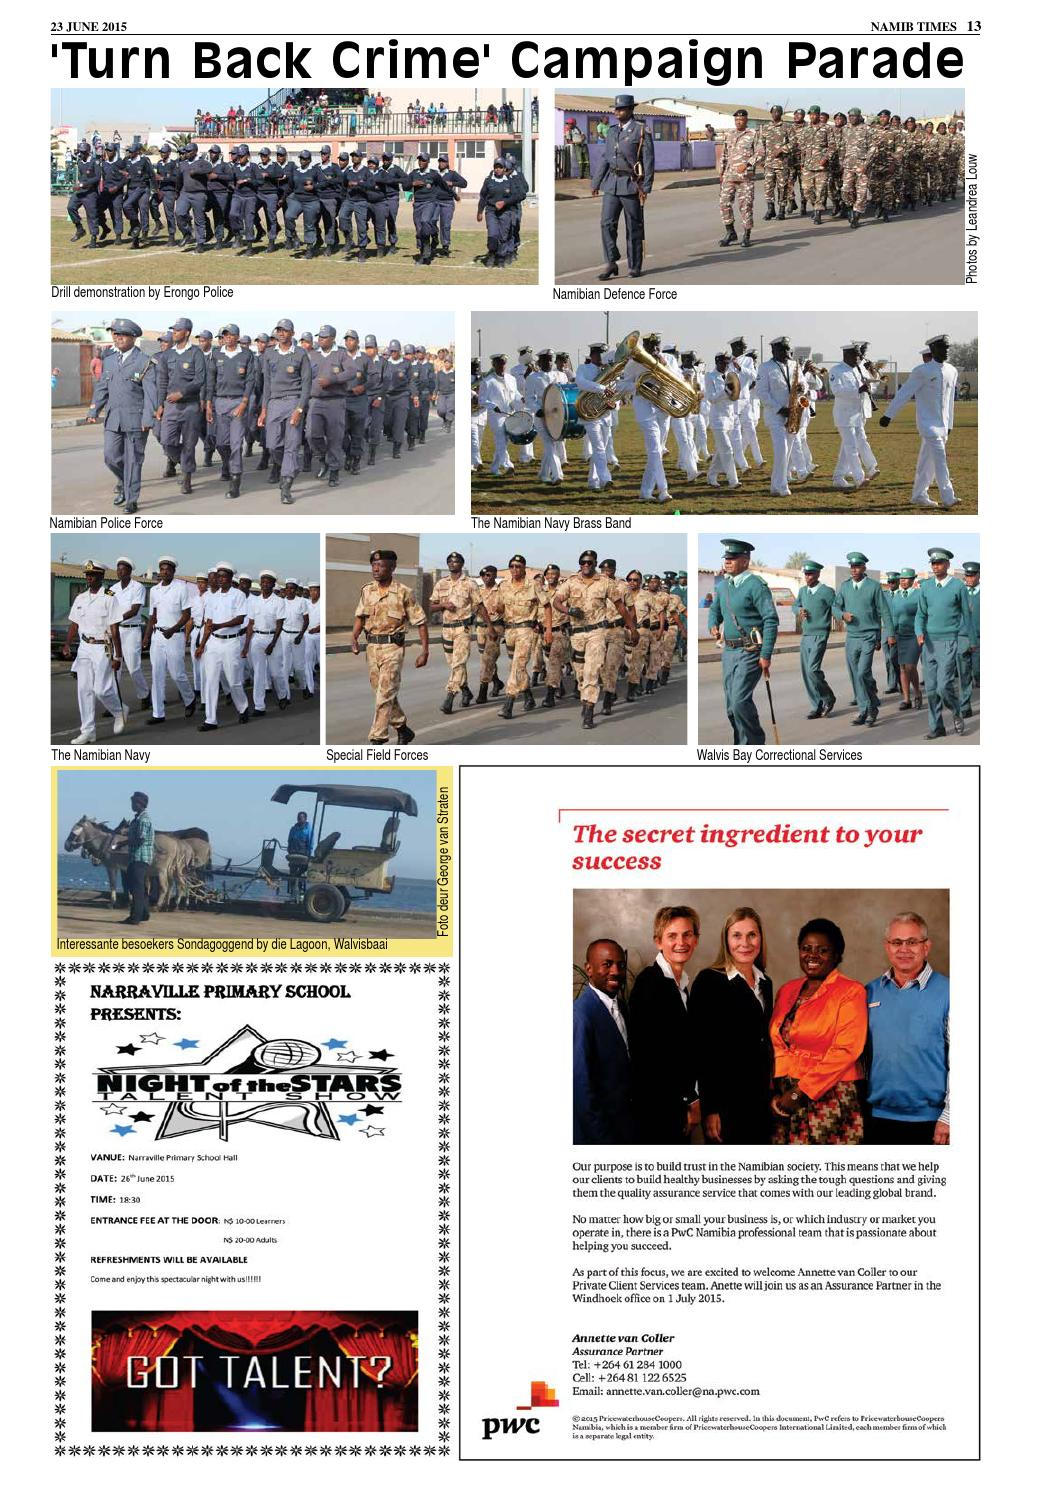 namibtimes docs november namib times e edition